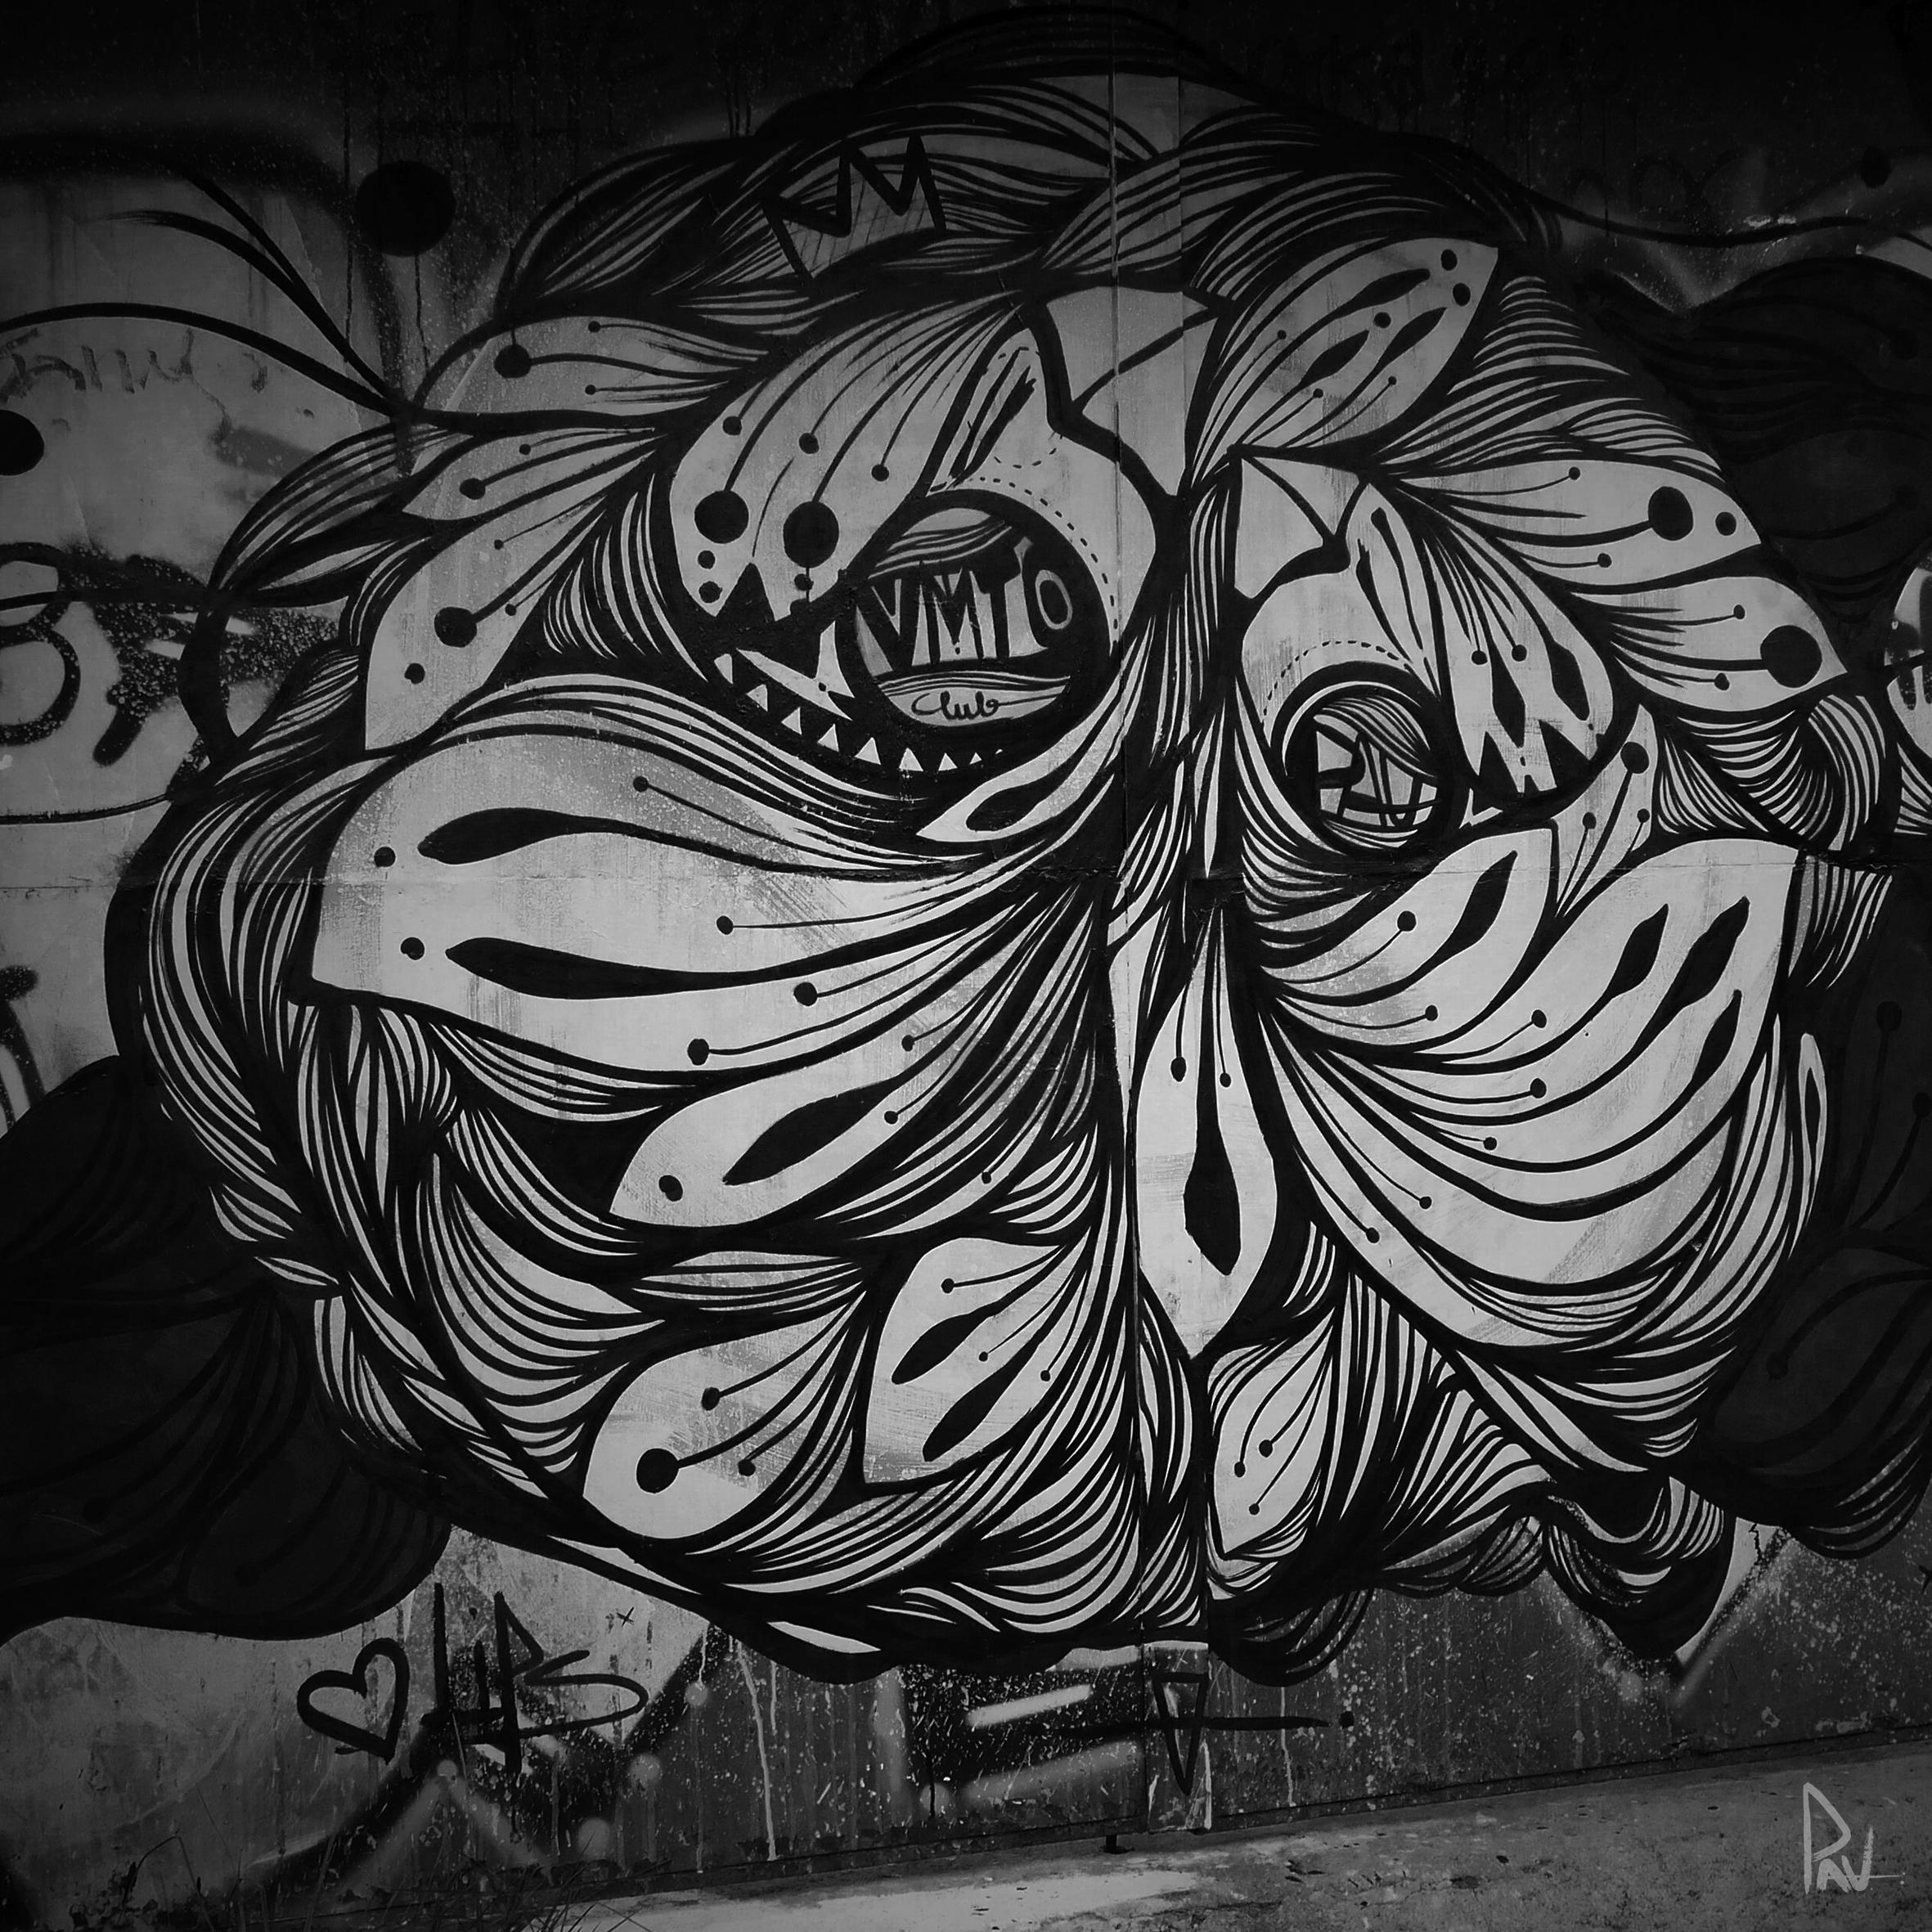 VALPARAISO - Mural painted at Cerro Alegre, Valparaiso-Chile 2016